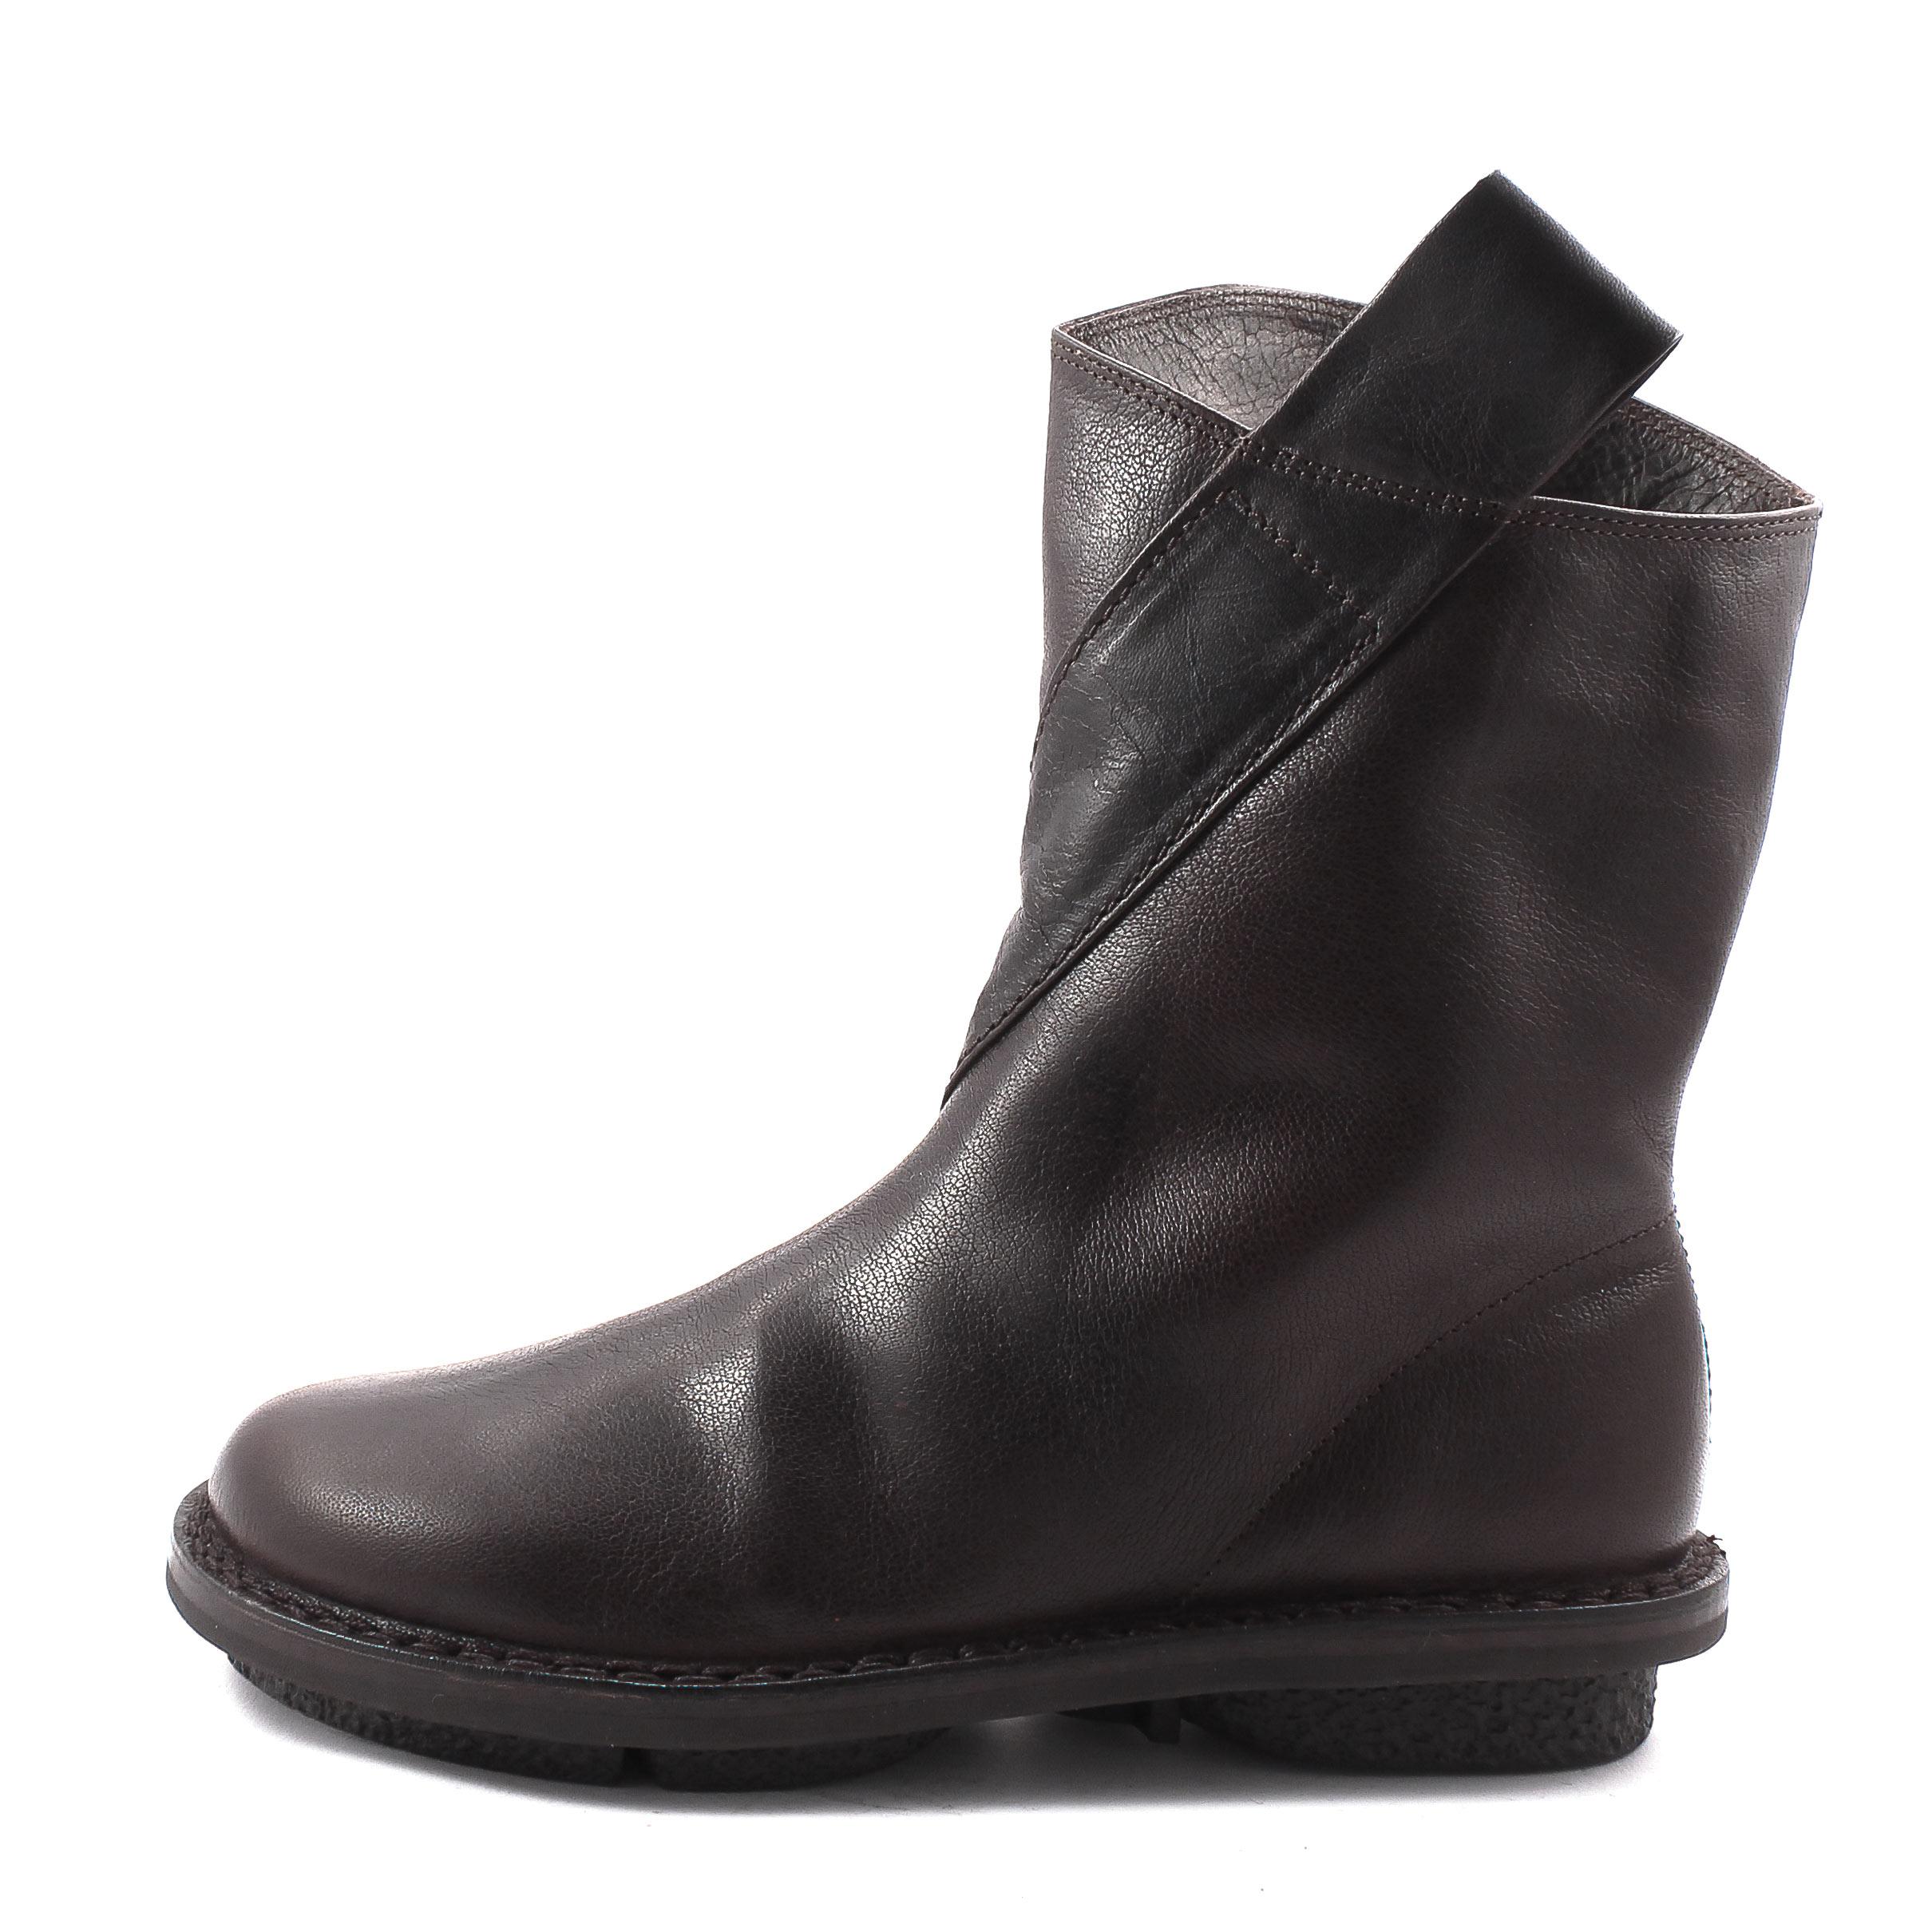 Trippen, Exit f Closed Womens Lambskin Bootees, dark brown Größe 41